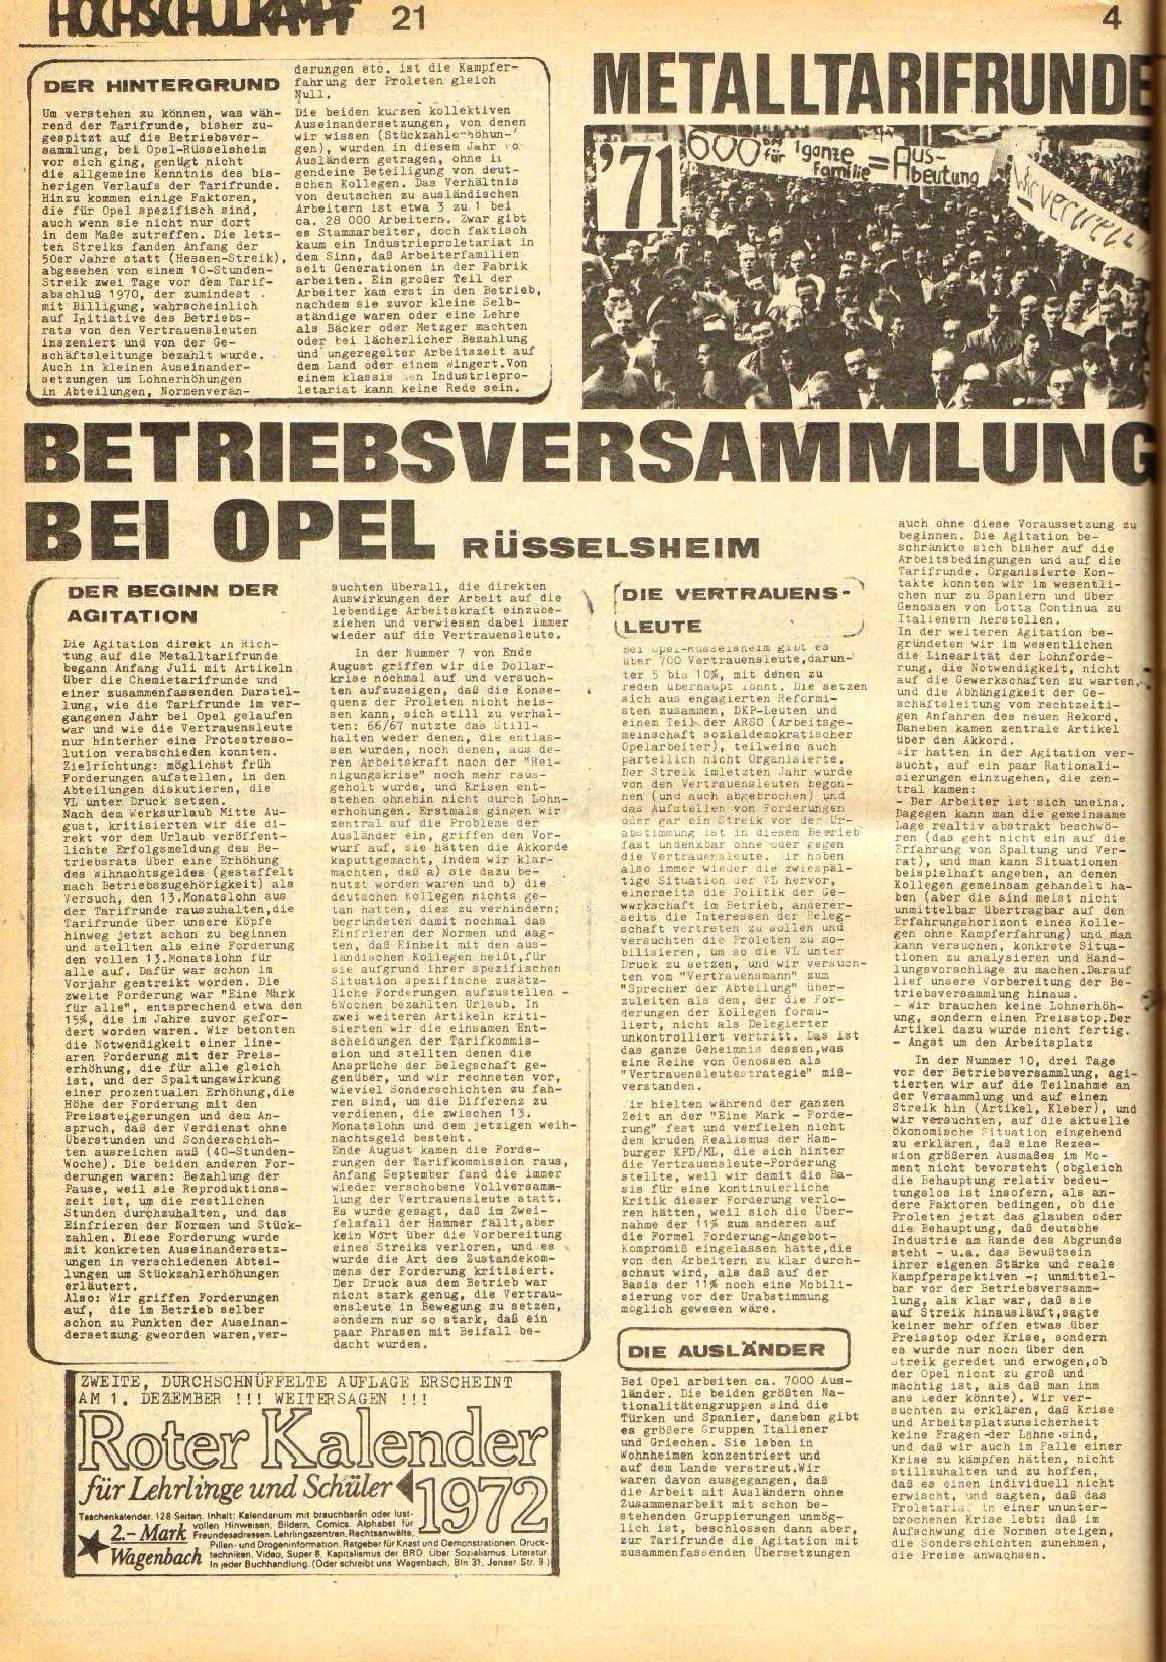 Berlin_Hochschulkampf_1971_21_06